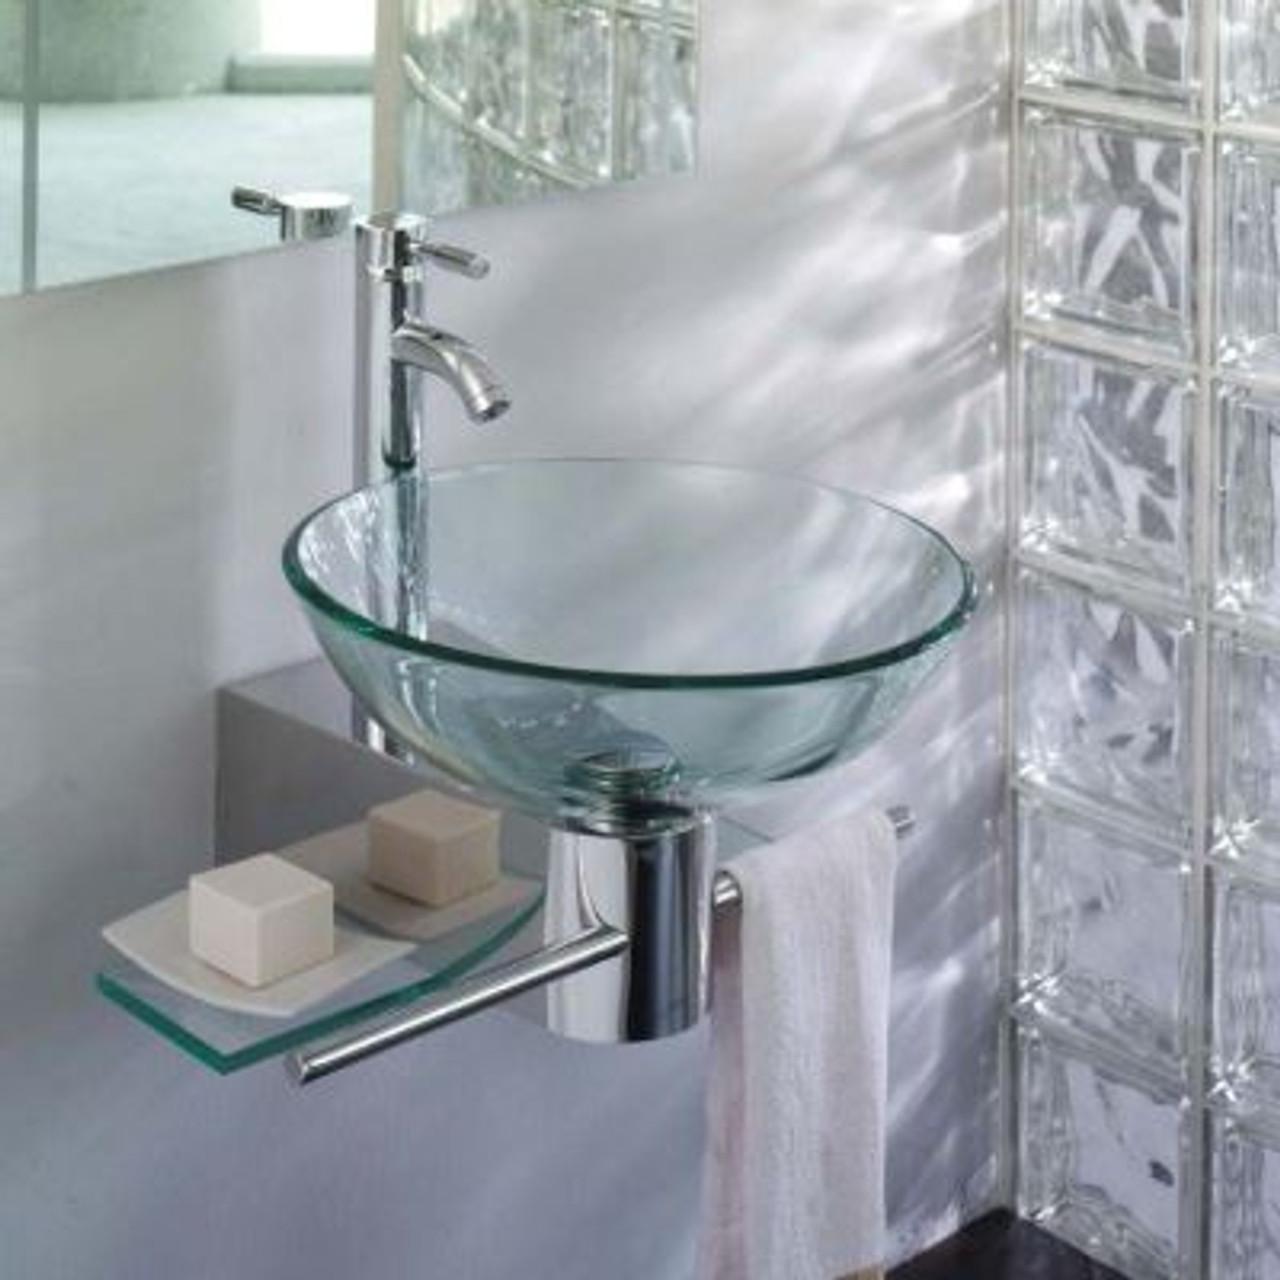 Lv 002r Lorixon Small Bathroom Vanity Glass Bowl Vessel Sink Combo Set Product